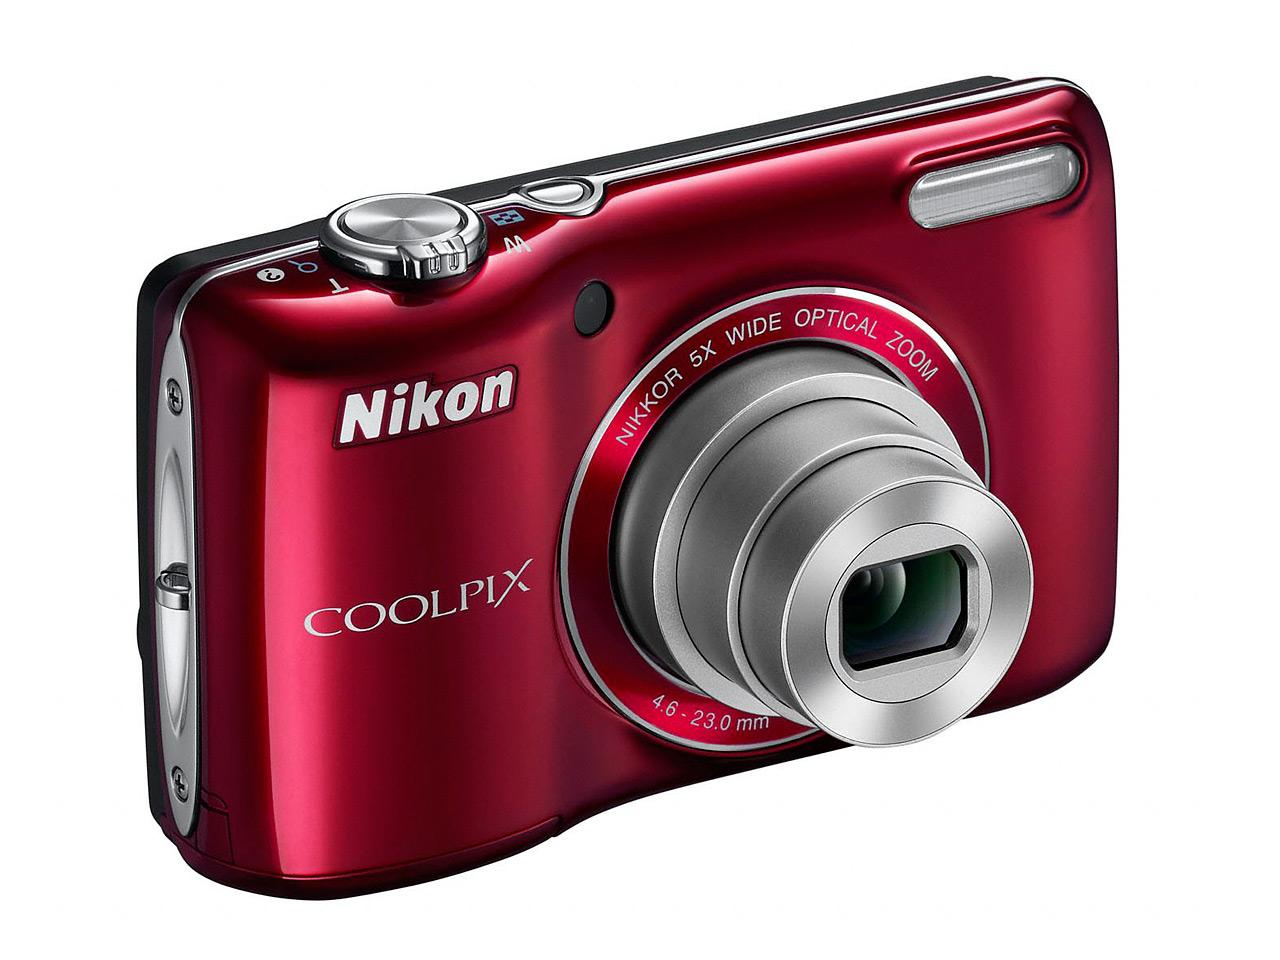 Nikon Updates Compact Lineup Including Coolpix S30 Entry Level L810 L26